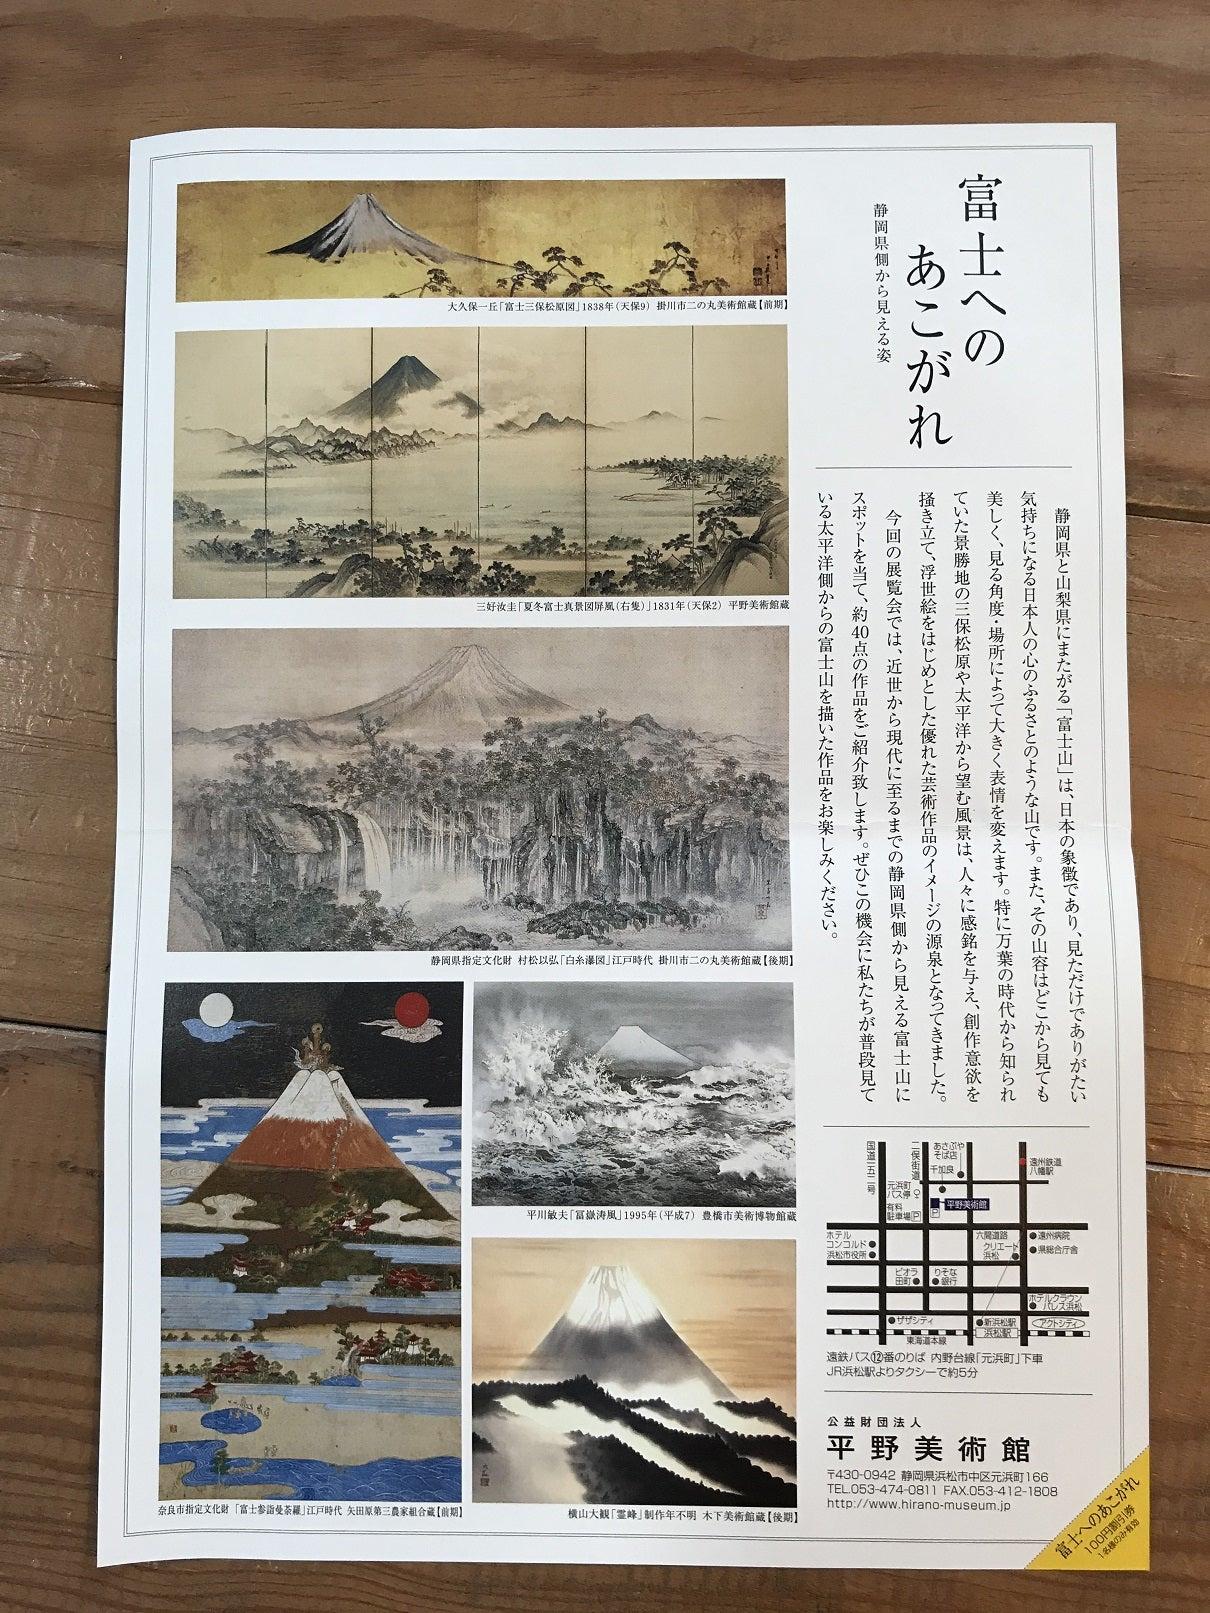 santafe-styleのブログ平野美術館で富士山に因む展示が